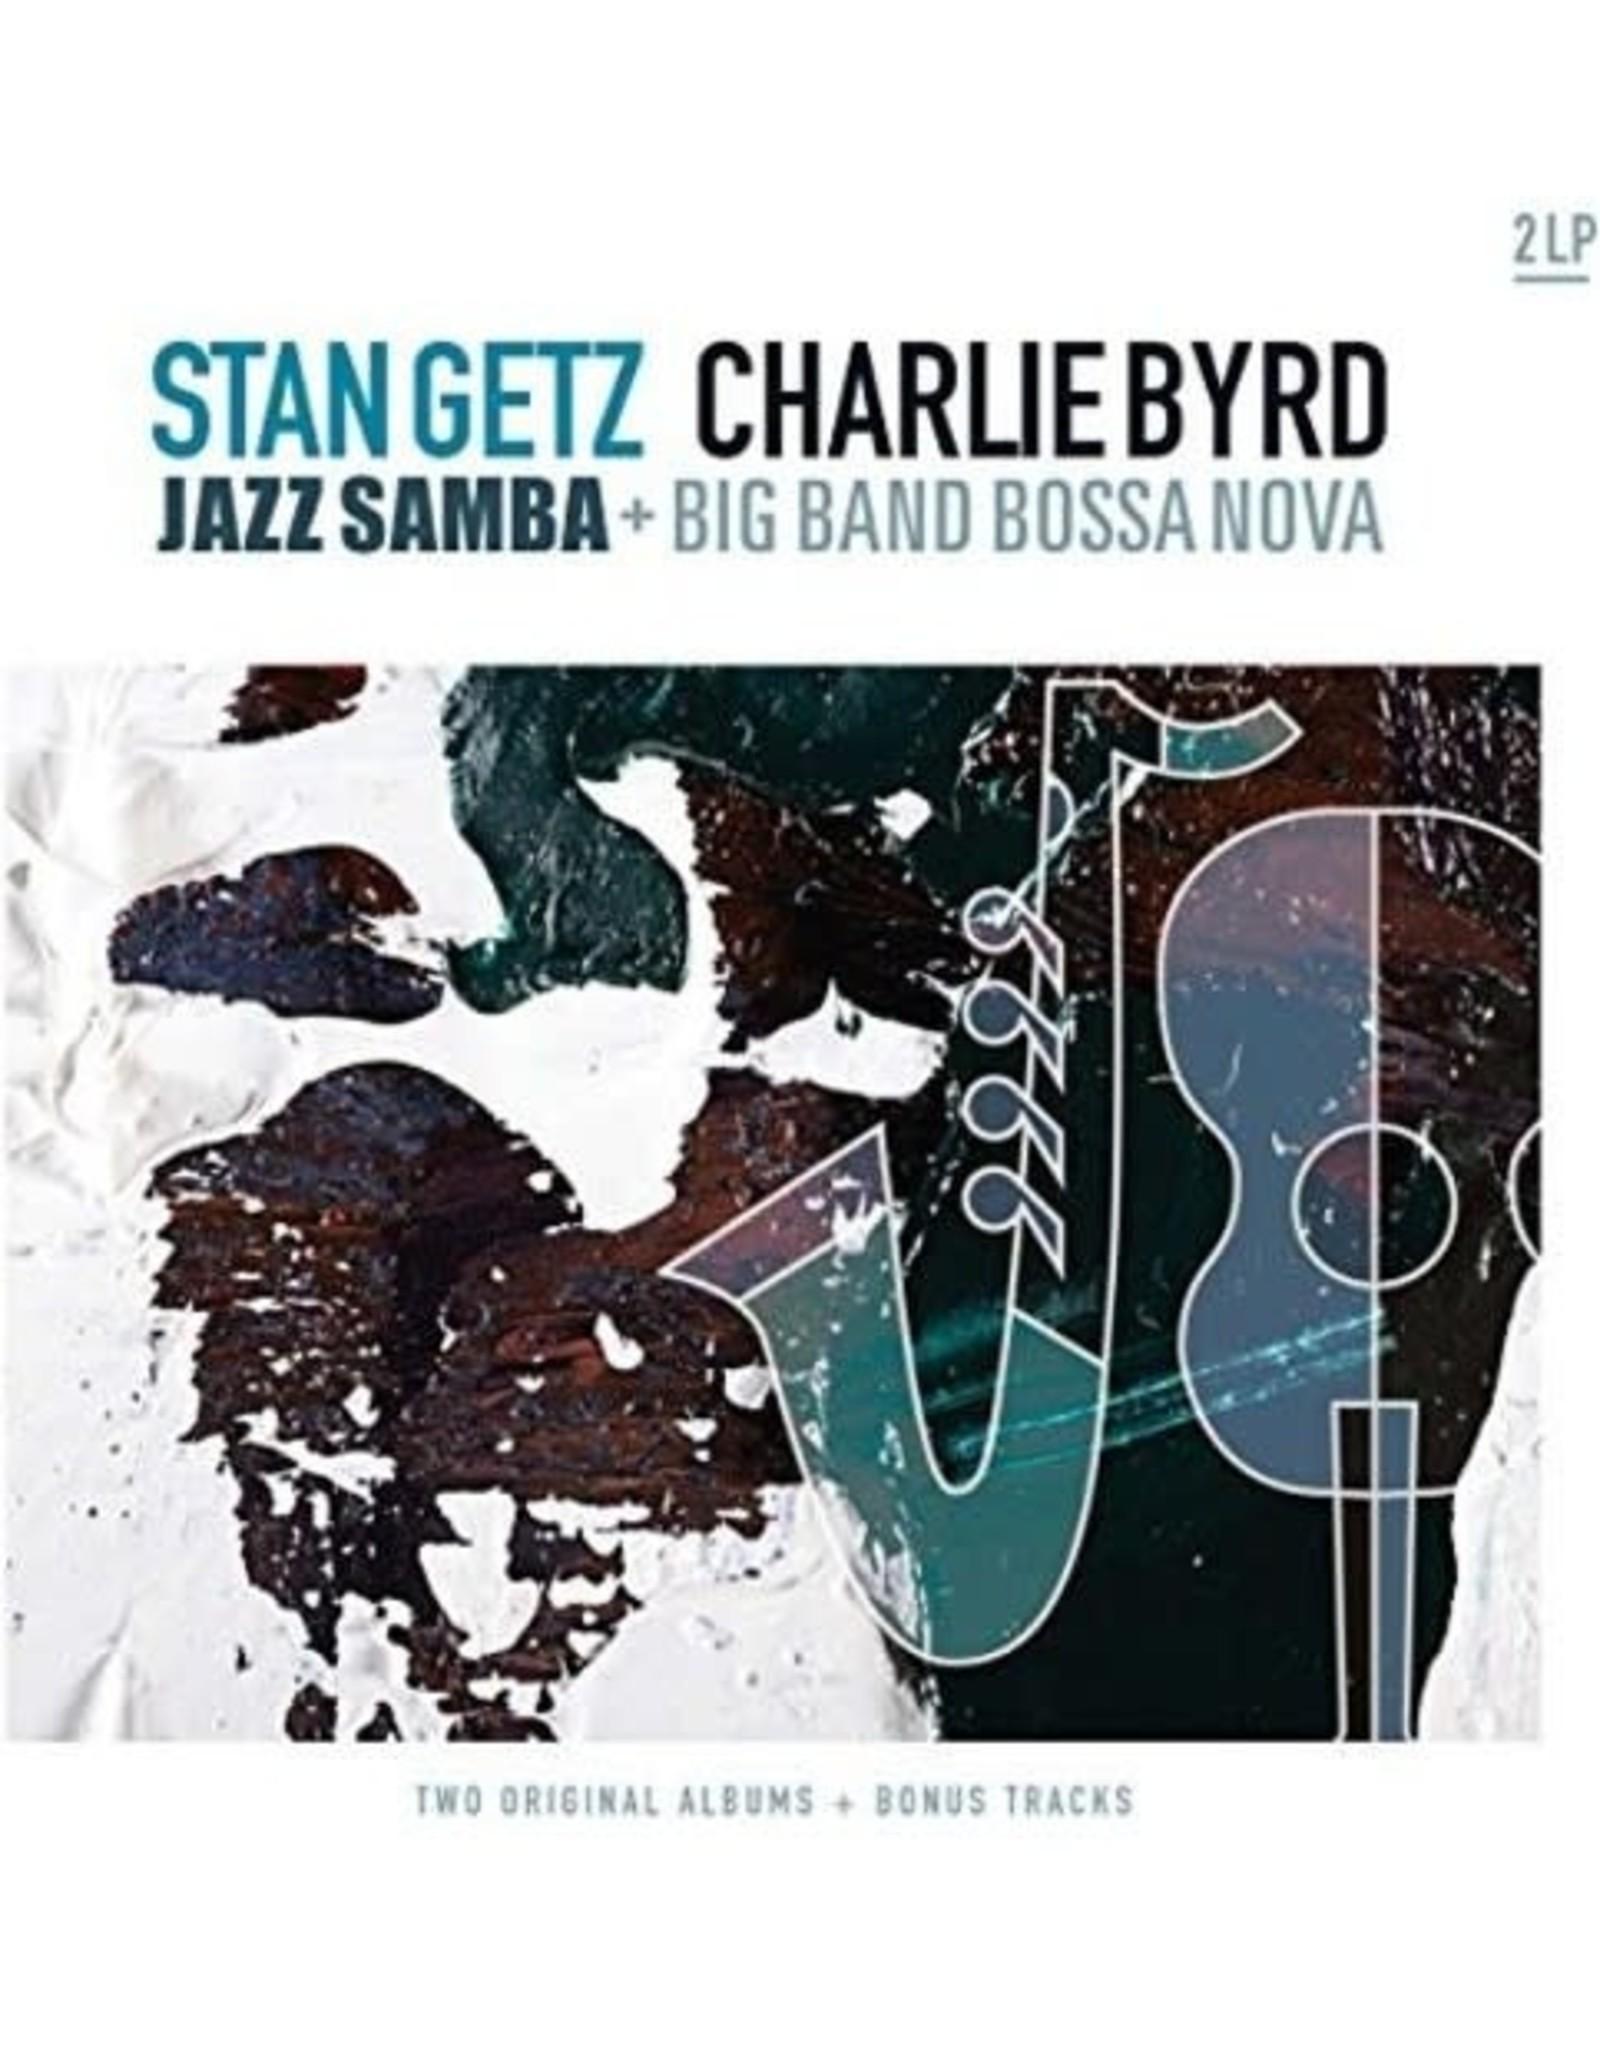 New Vinyl Stan Getz - Jazz Samba & Big Band Bossa Nova 2LP